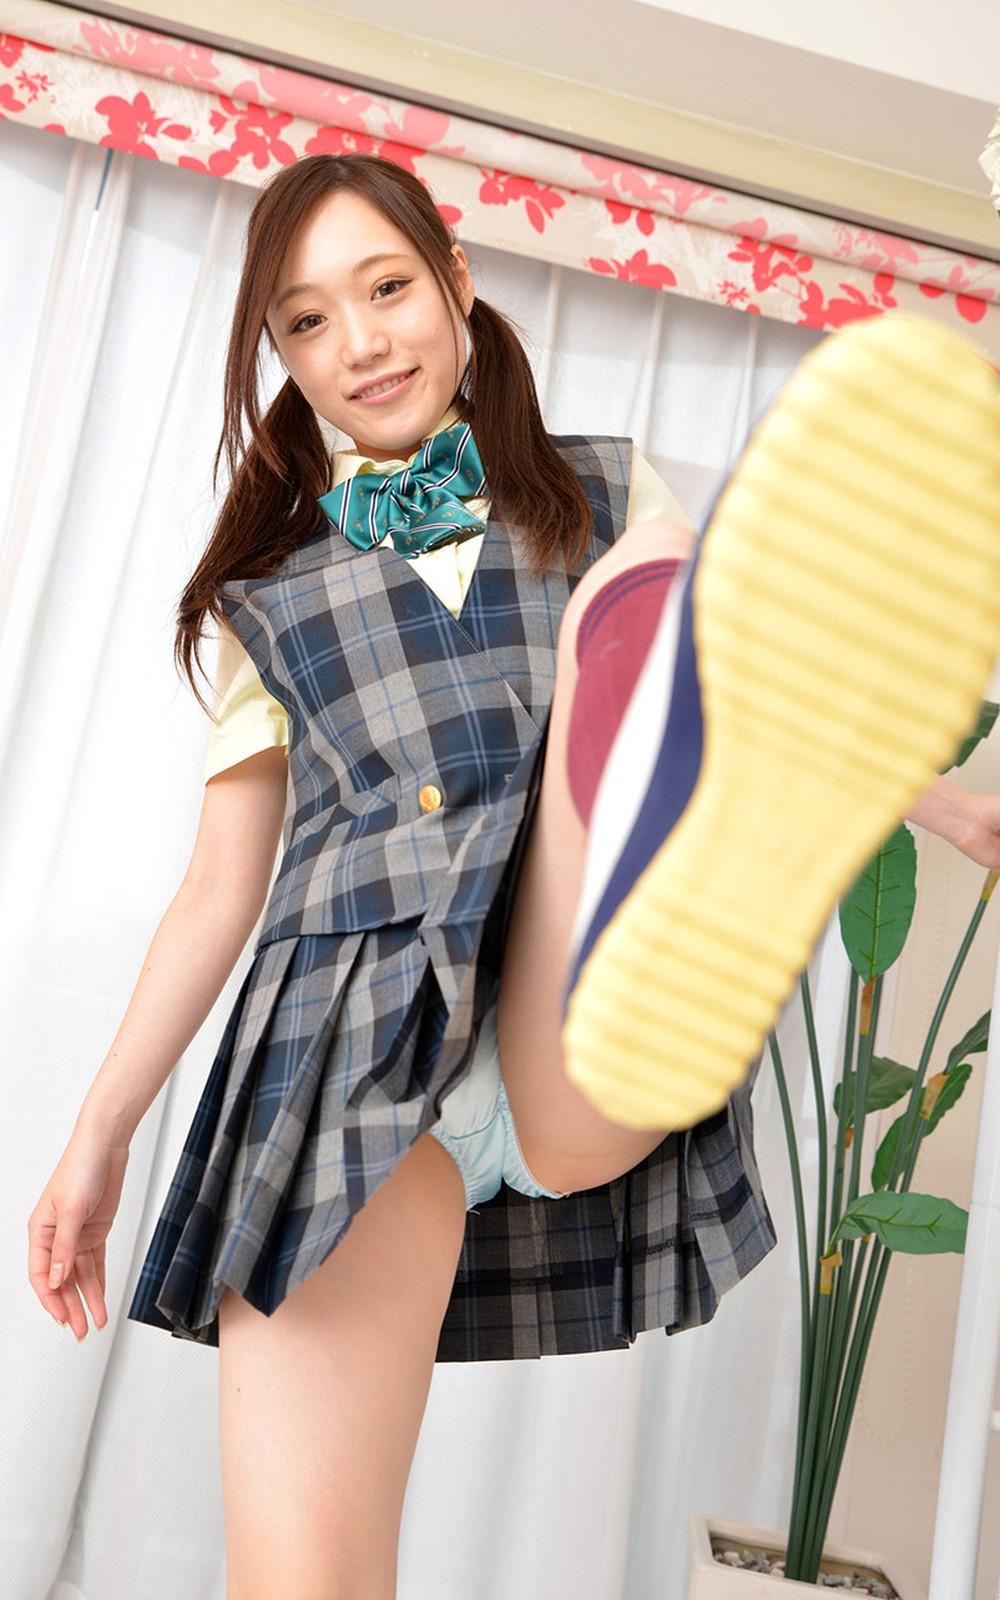 JKパンチラ!女子高生の制服姿のエロ画像32枚・37枚目の画像